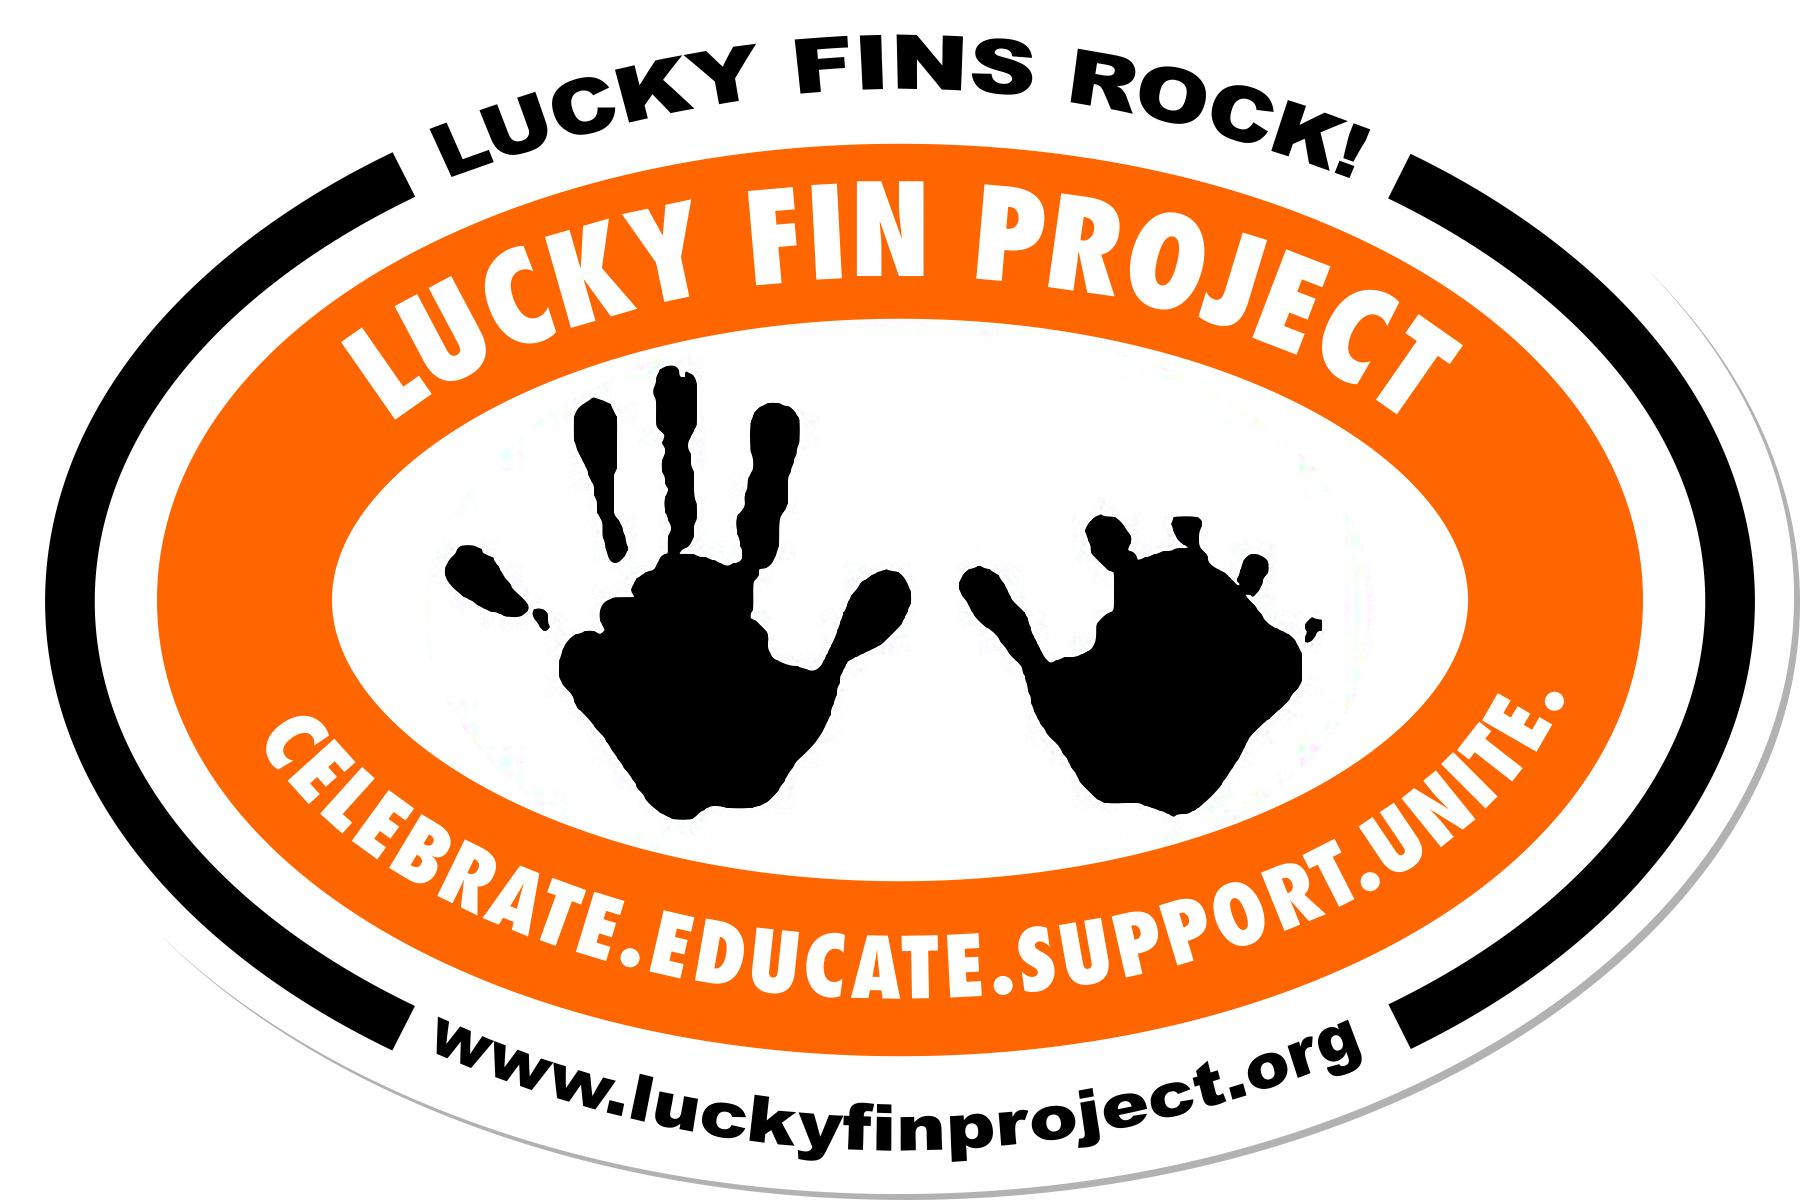 Lucky Fin Project Logo 4 x 6 Oval Bumper Magnet LFP-Magnet